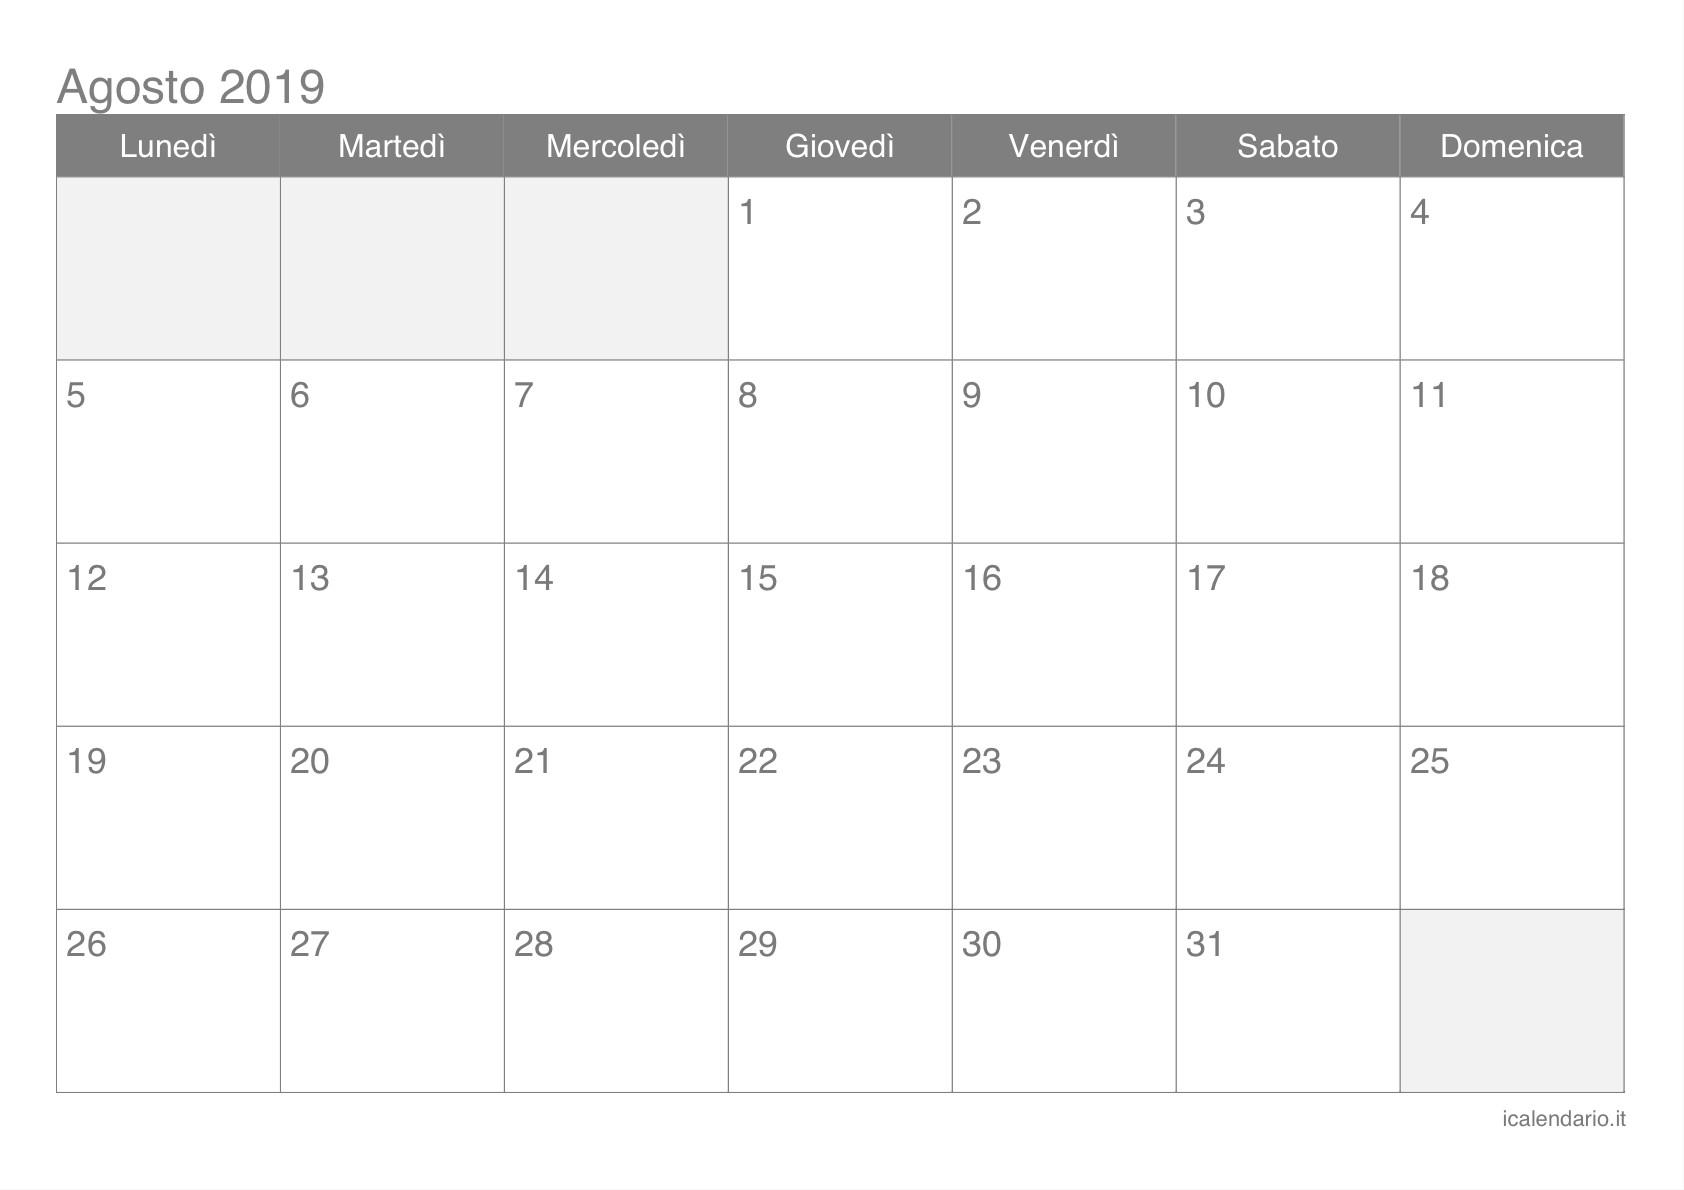 Calendario Agosto Settembre 2019 Más Recientemente Liberado Calendario Agosto 2019 Da Stampare Icalendario